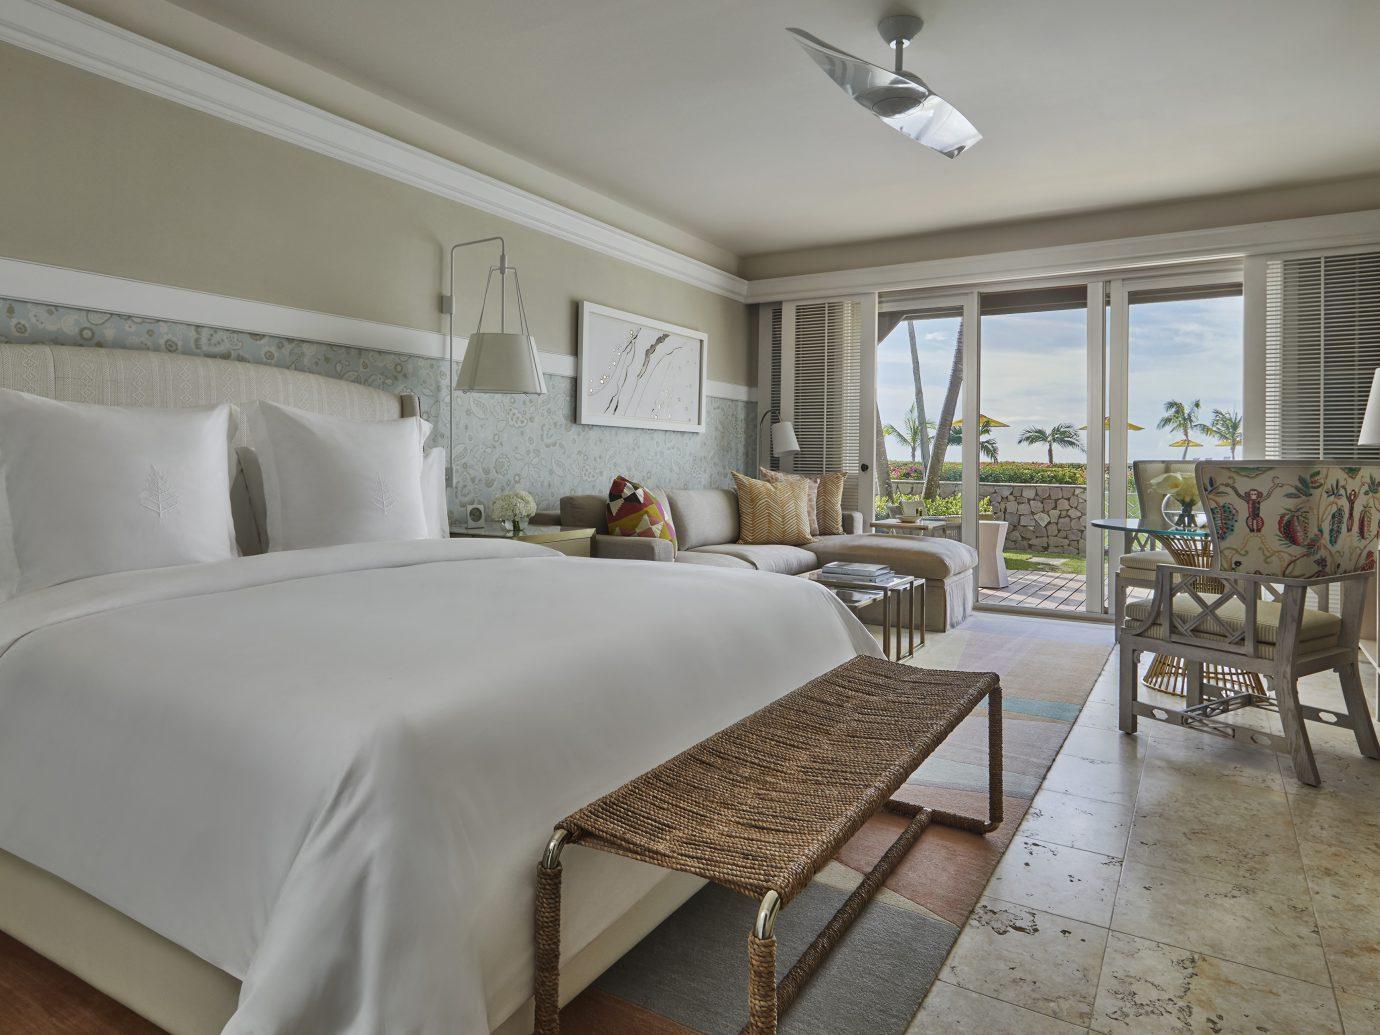 Bedroom at Four Seasons Resort Nevis